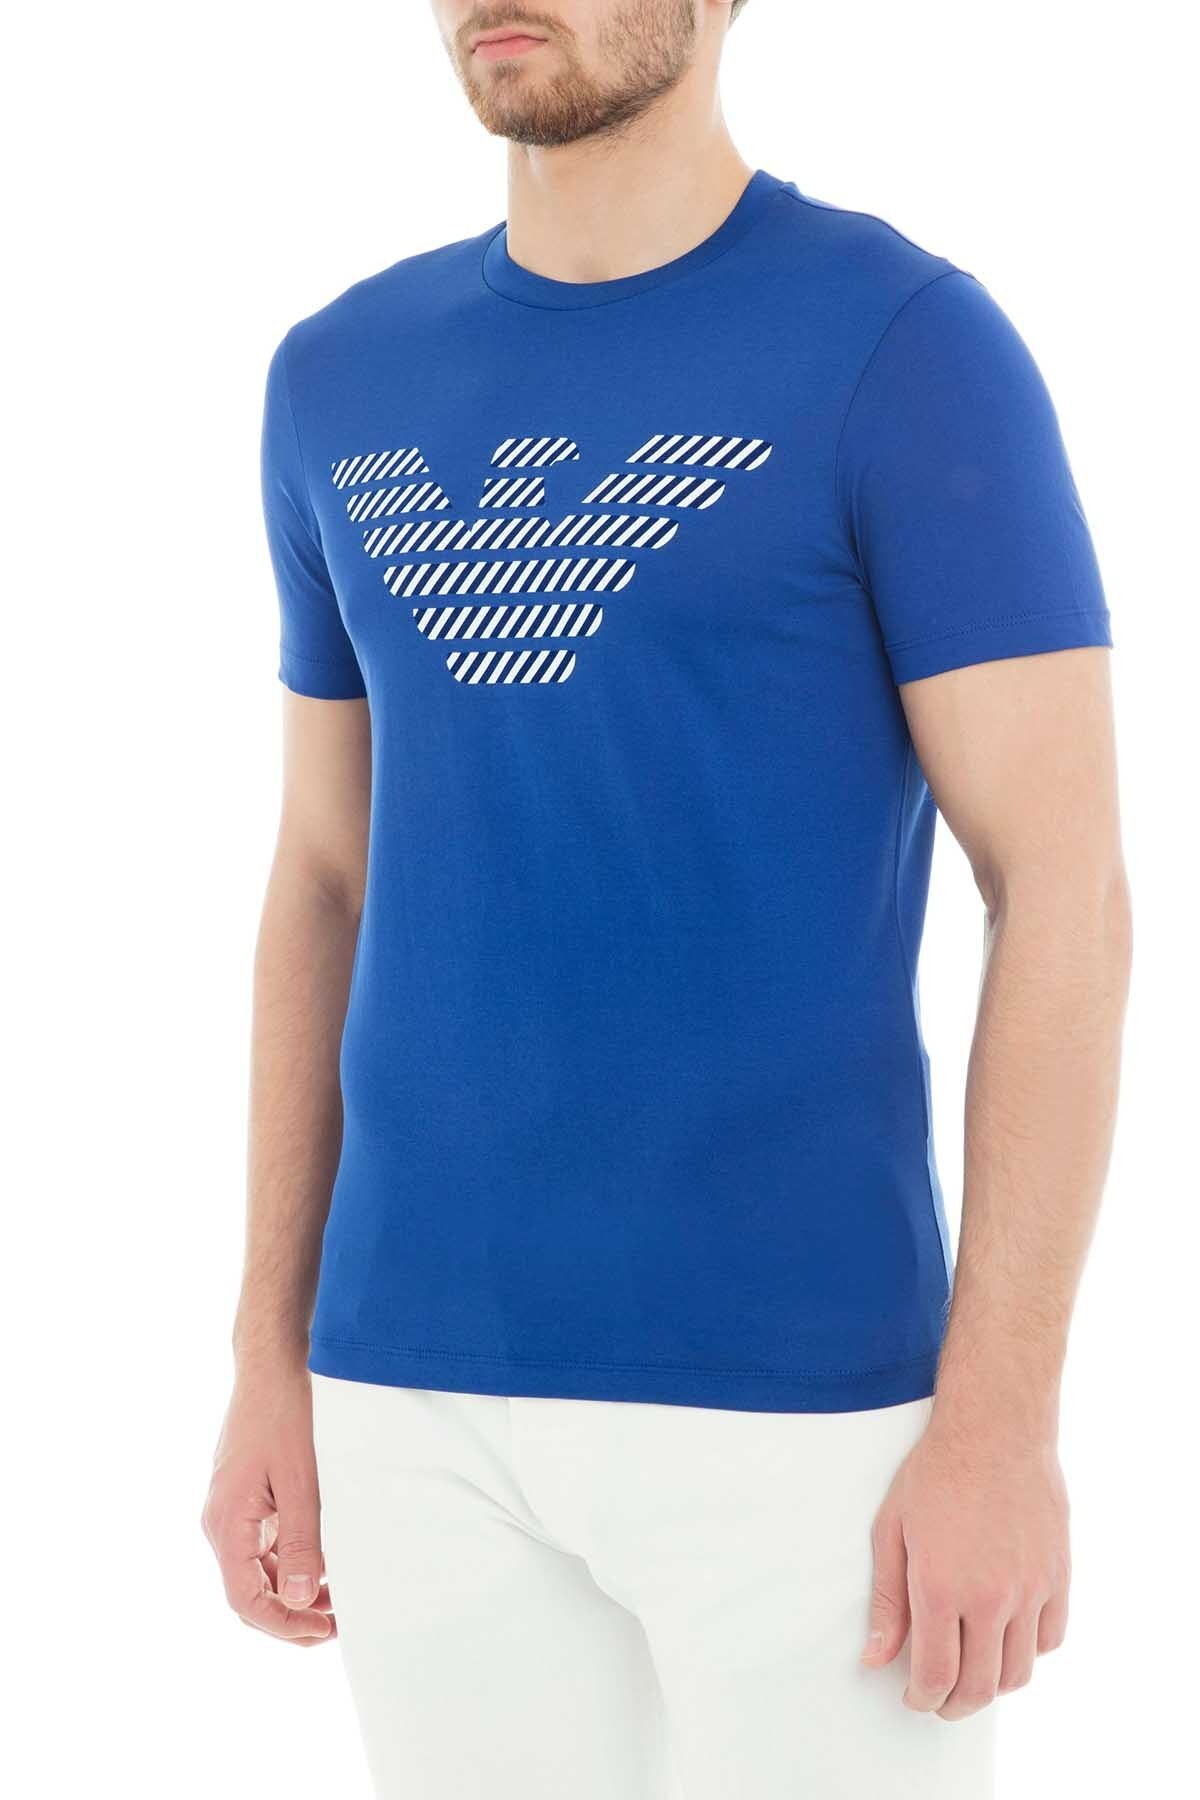 Emporio Armani Erkek T Shirt 3G1T94 1J30Z 0948 SAKS